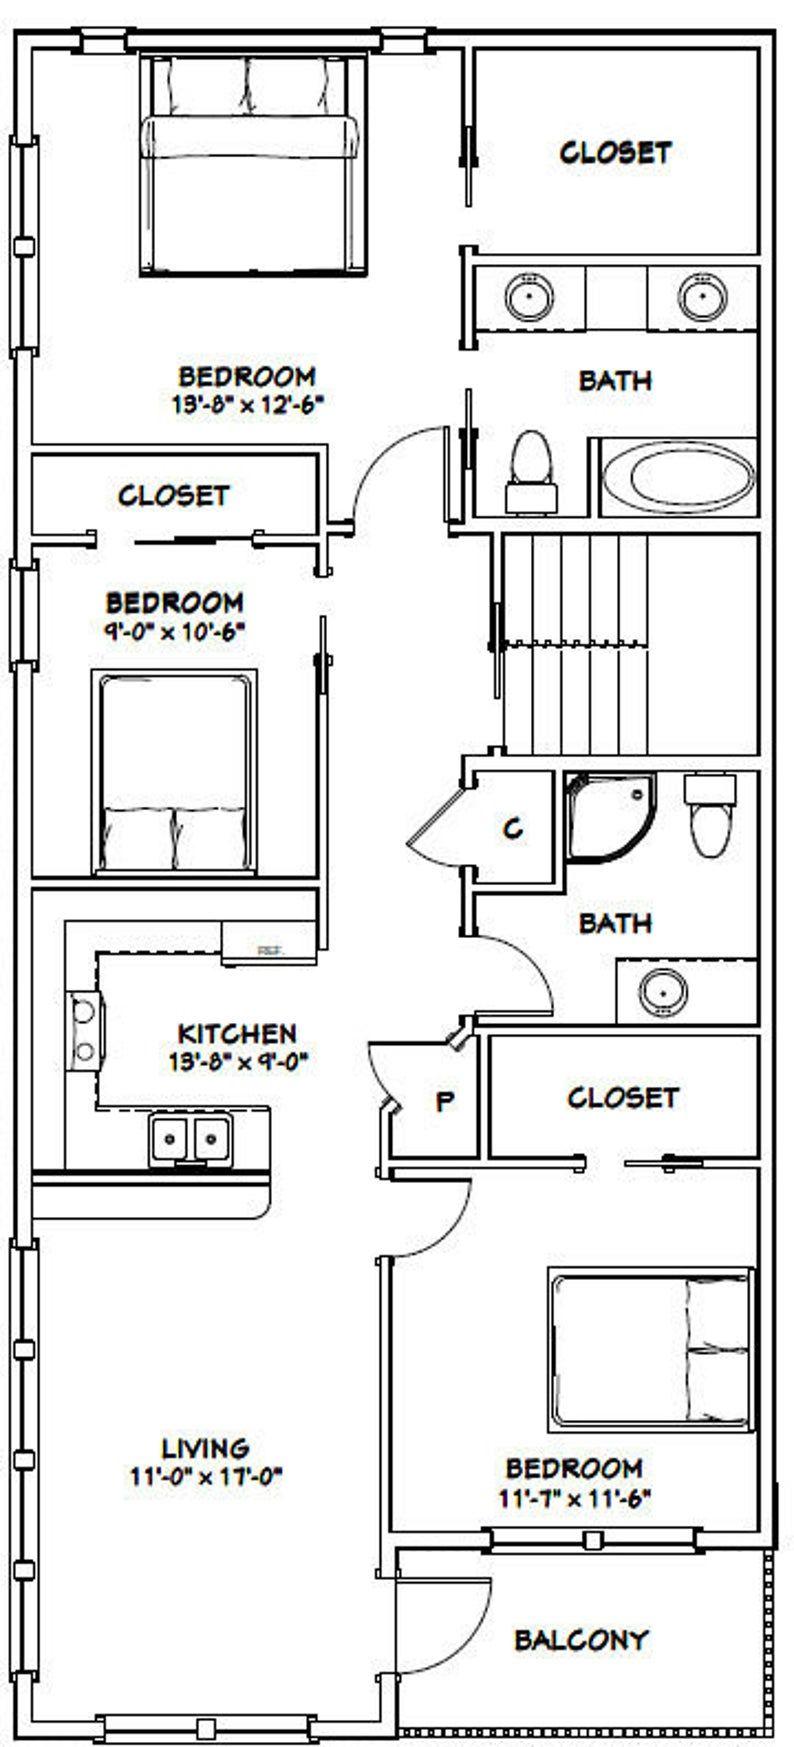 44x48 House 4Bedroom 3Bath 1,645 sq ft PDF